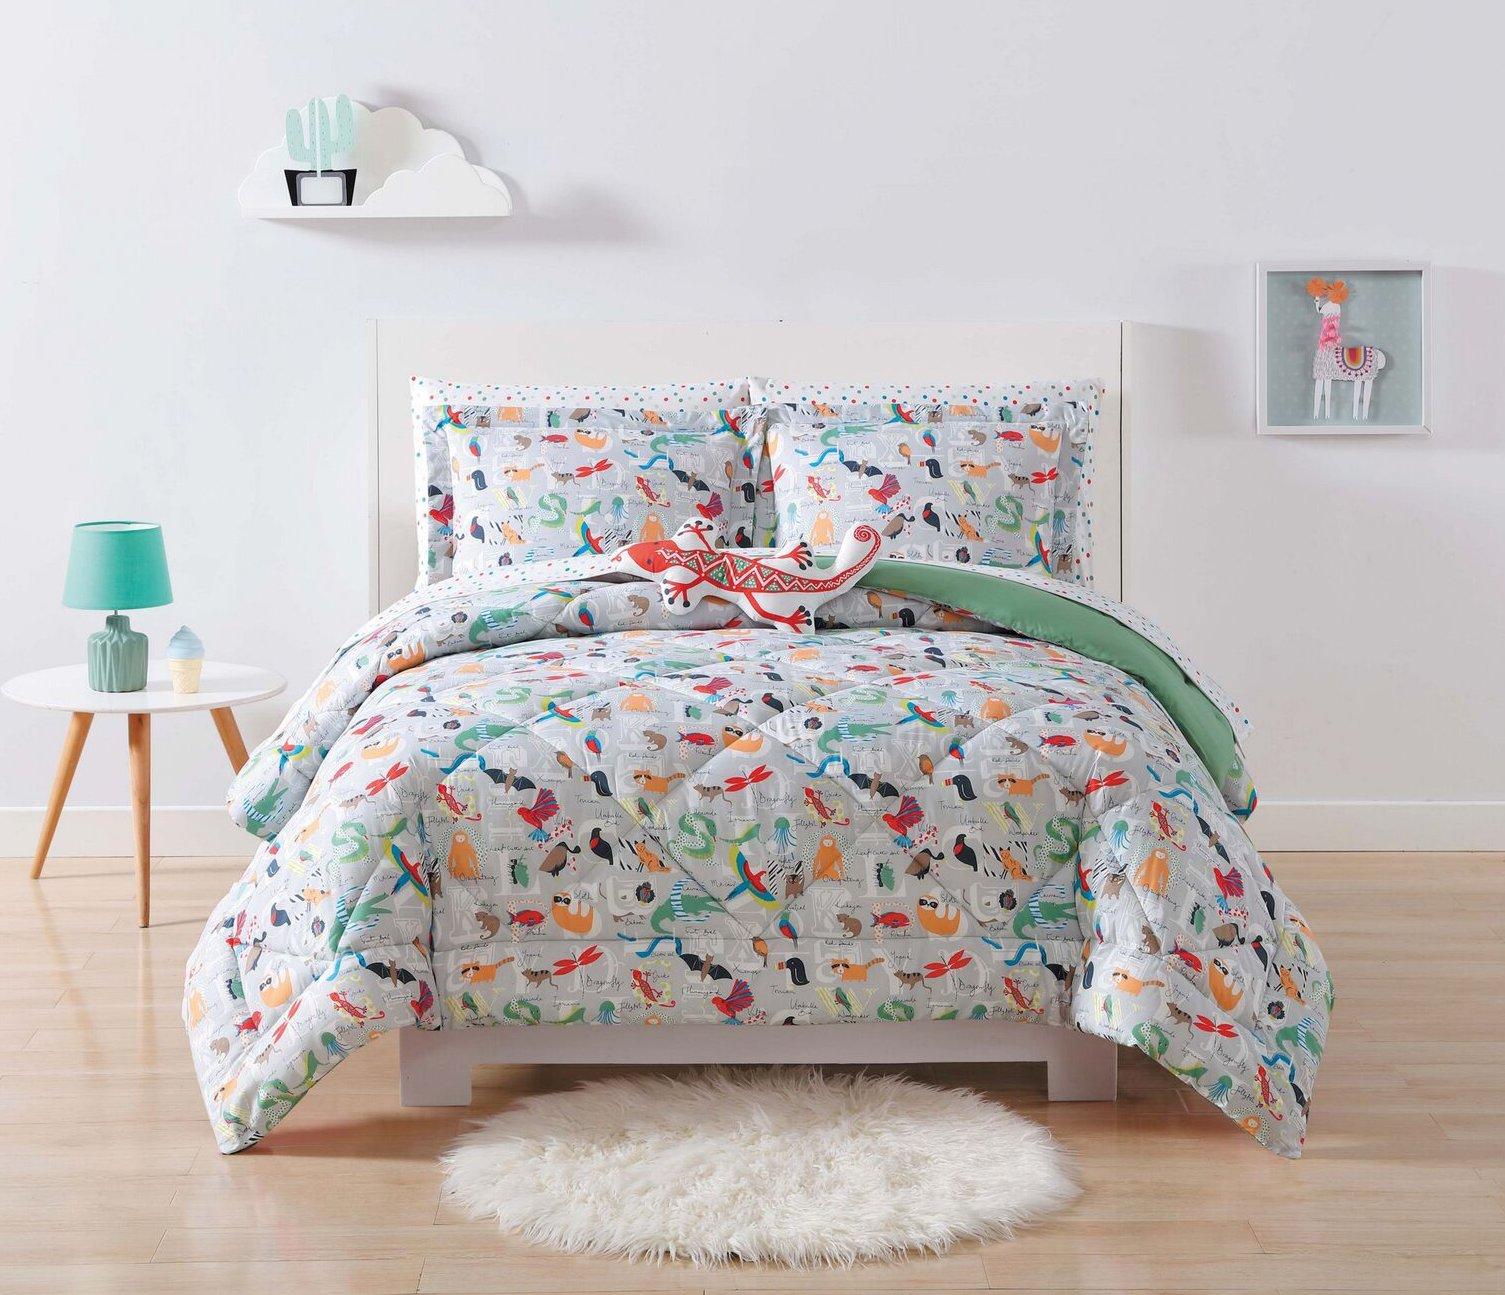 Laura Hart Kids Comforter Set, Twin/Twin XL, Animal Alphabet by Laura Hart Kids (Image #1)